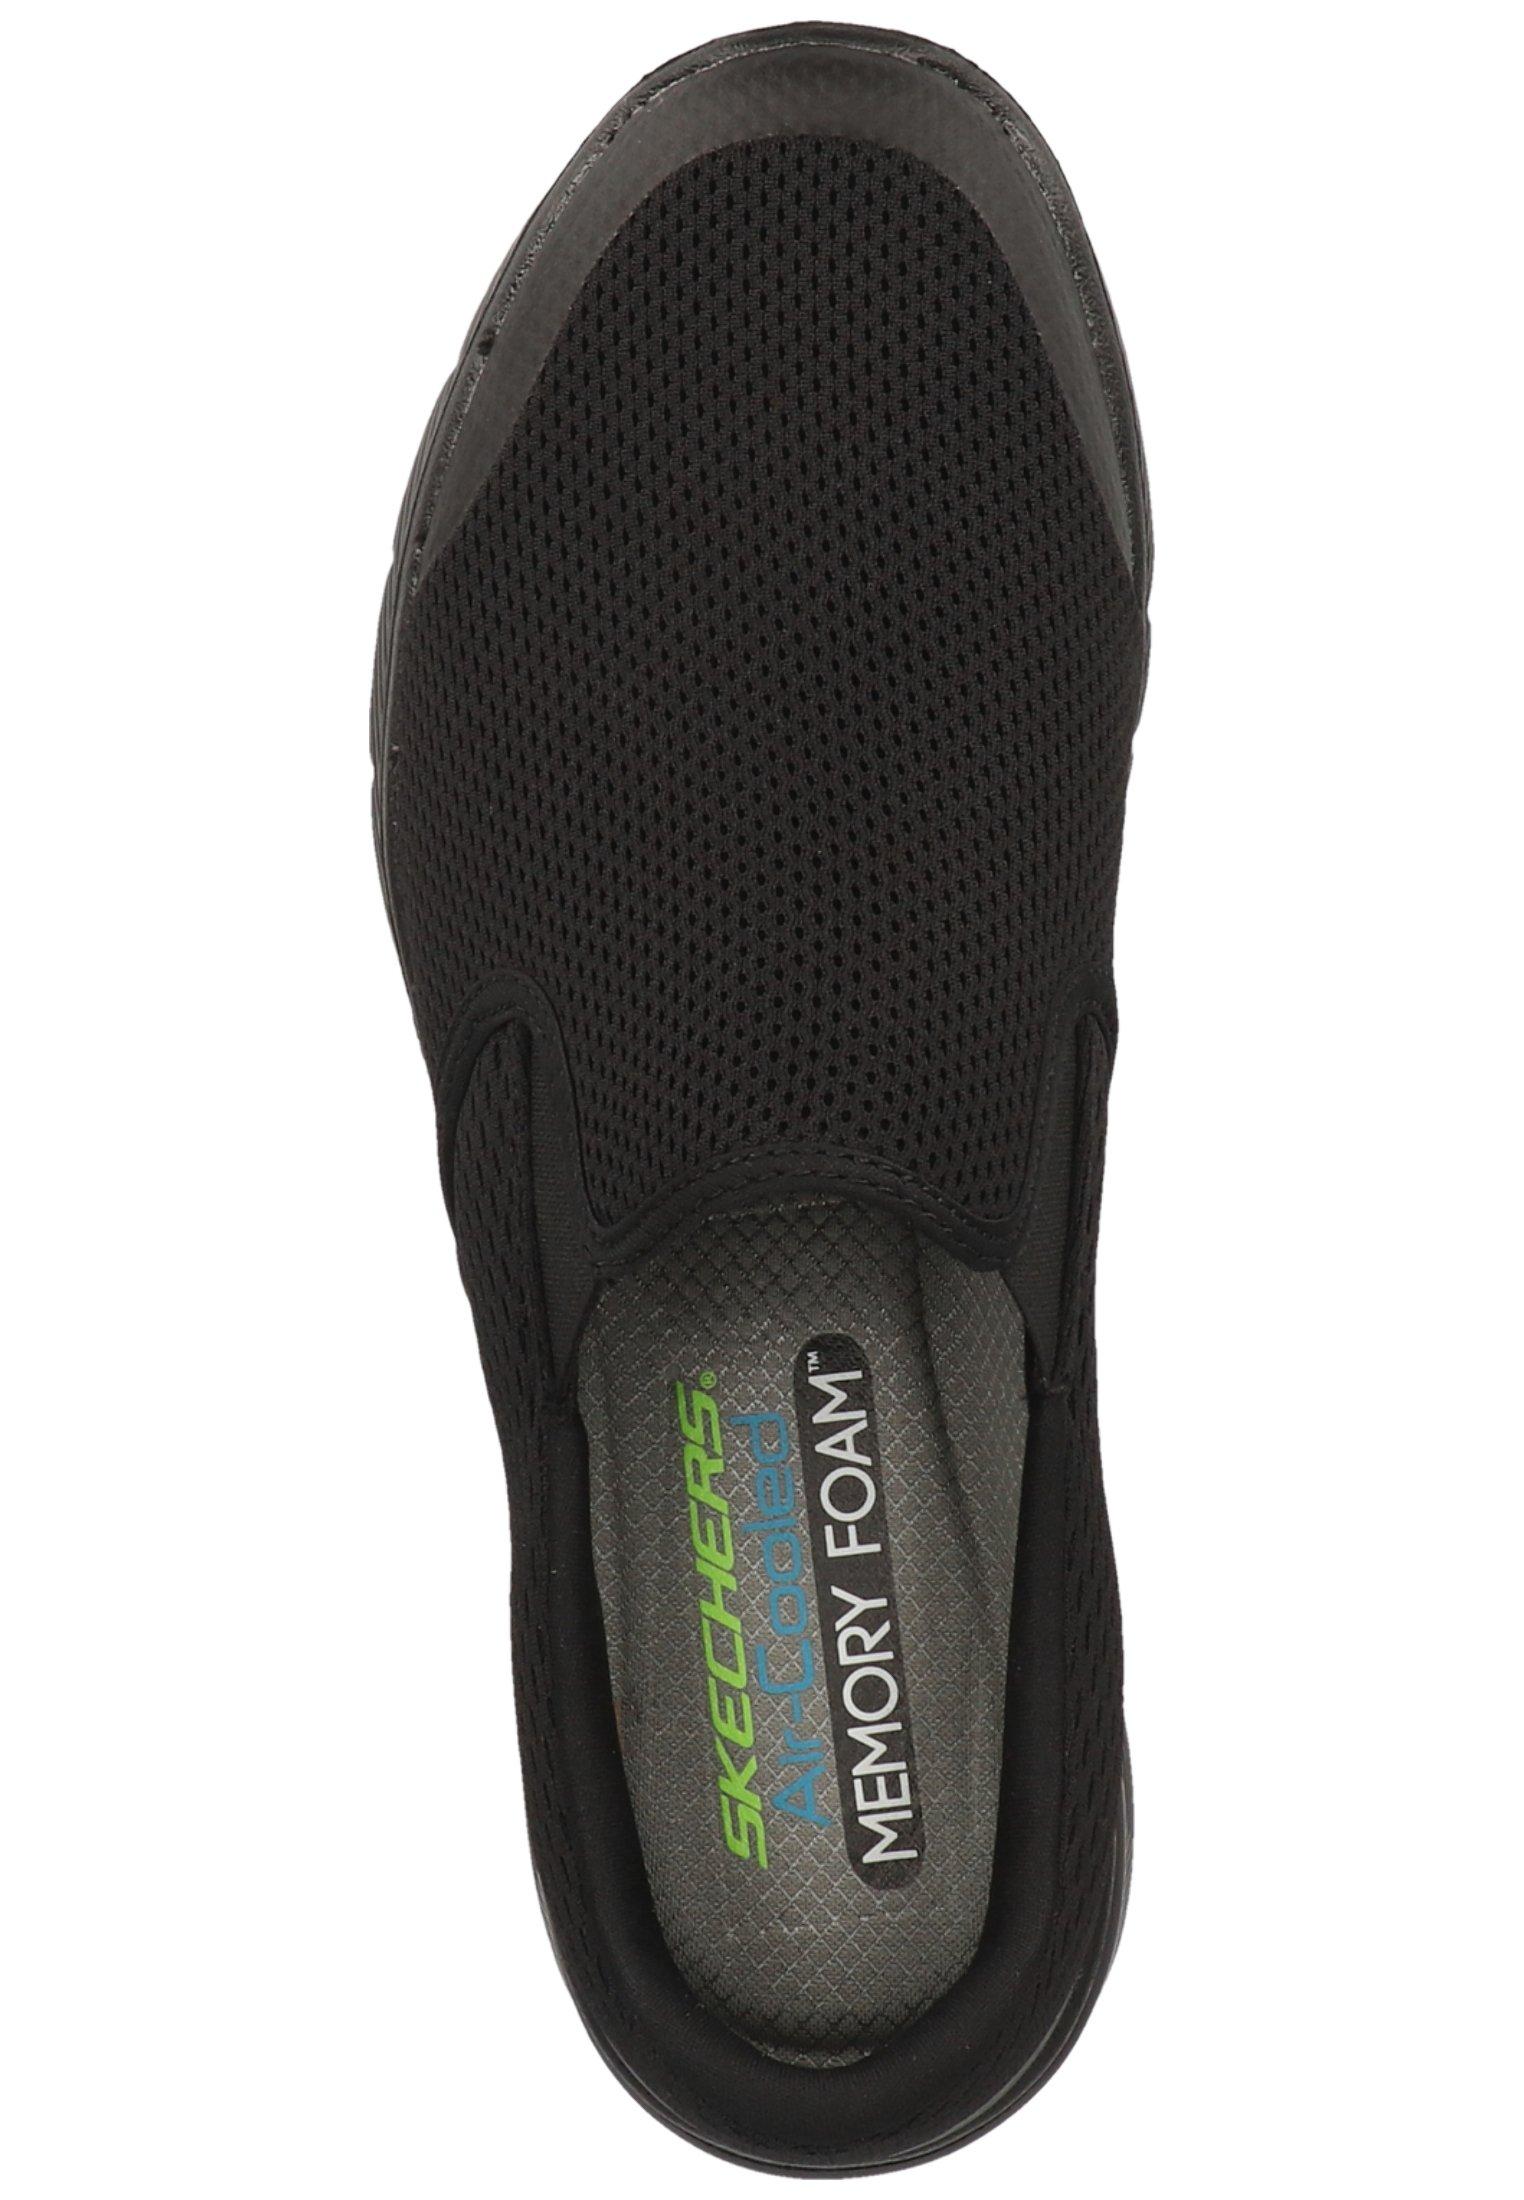 Skechers Sport Sneaker - Sneakers Schwarz Bbk